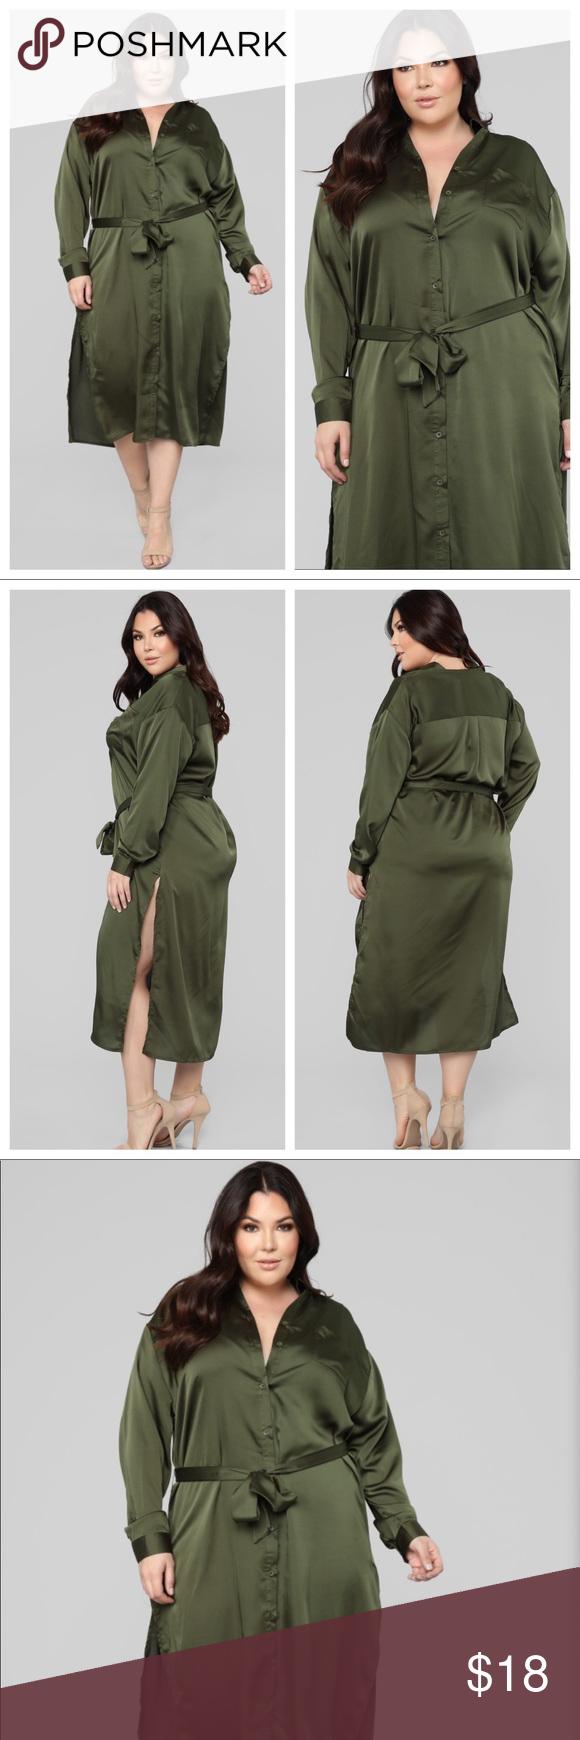 c7561e80 Fashion Nova Curve Satin Shirt Dress NWT / Never Worn True To Size 3X = 20